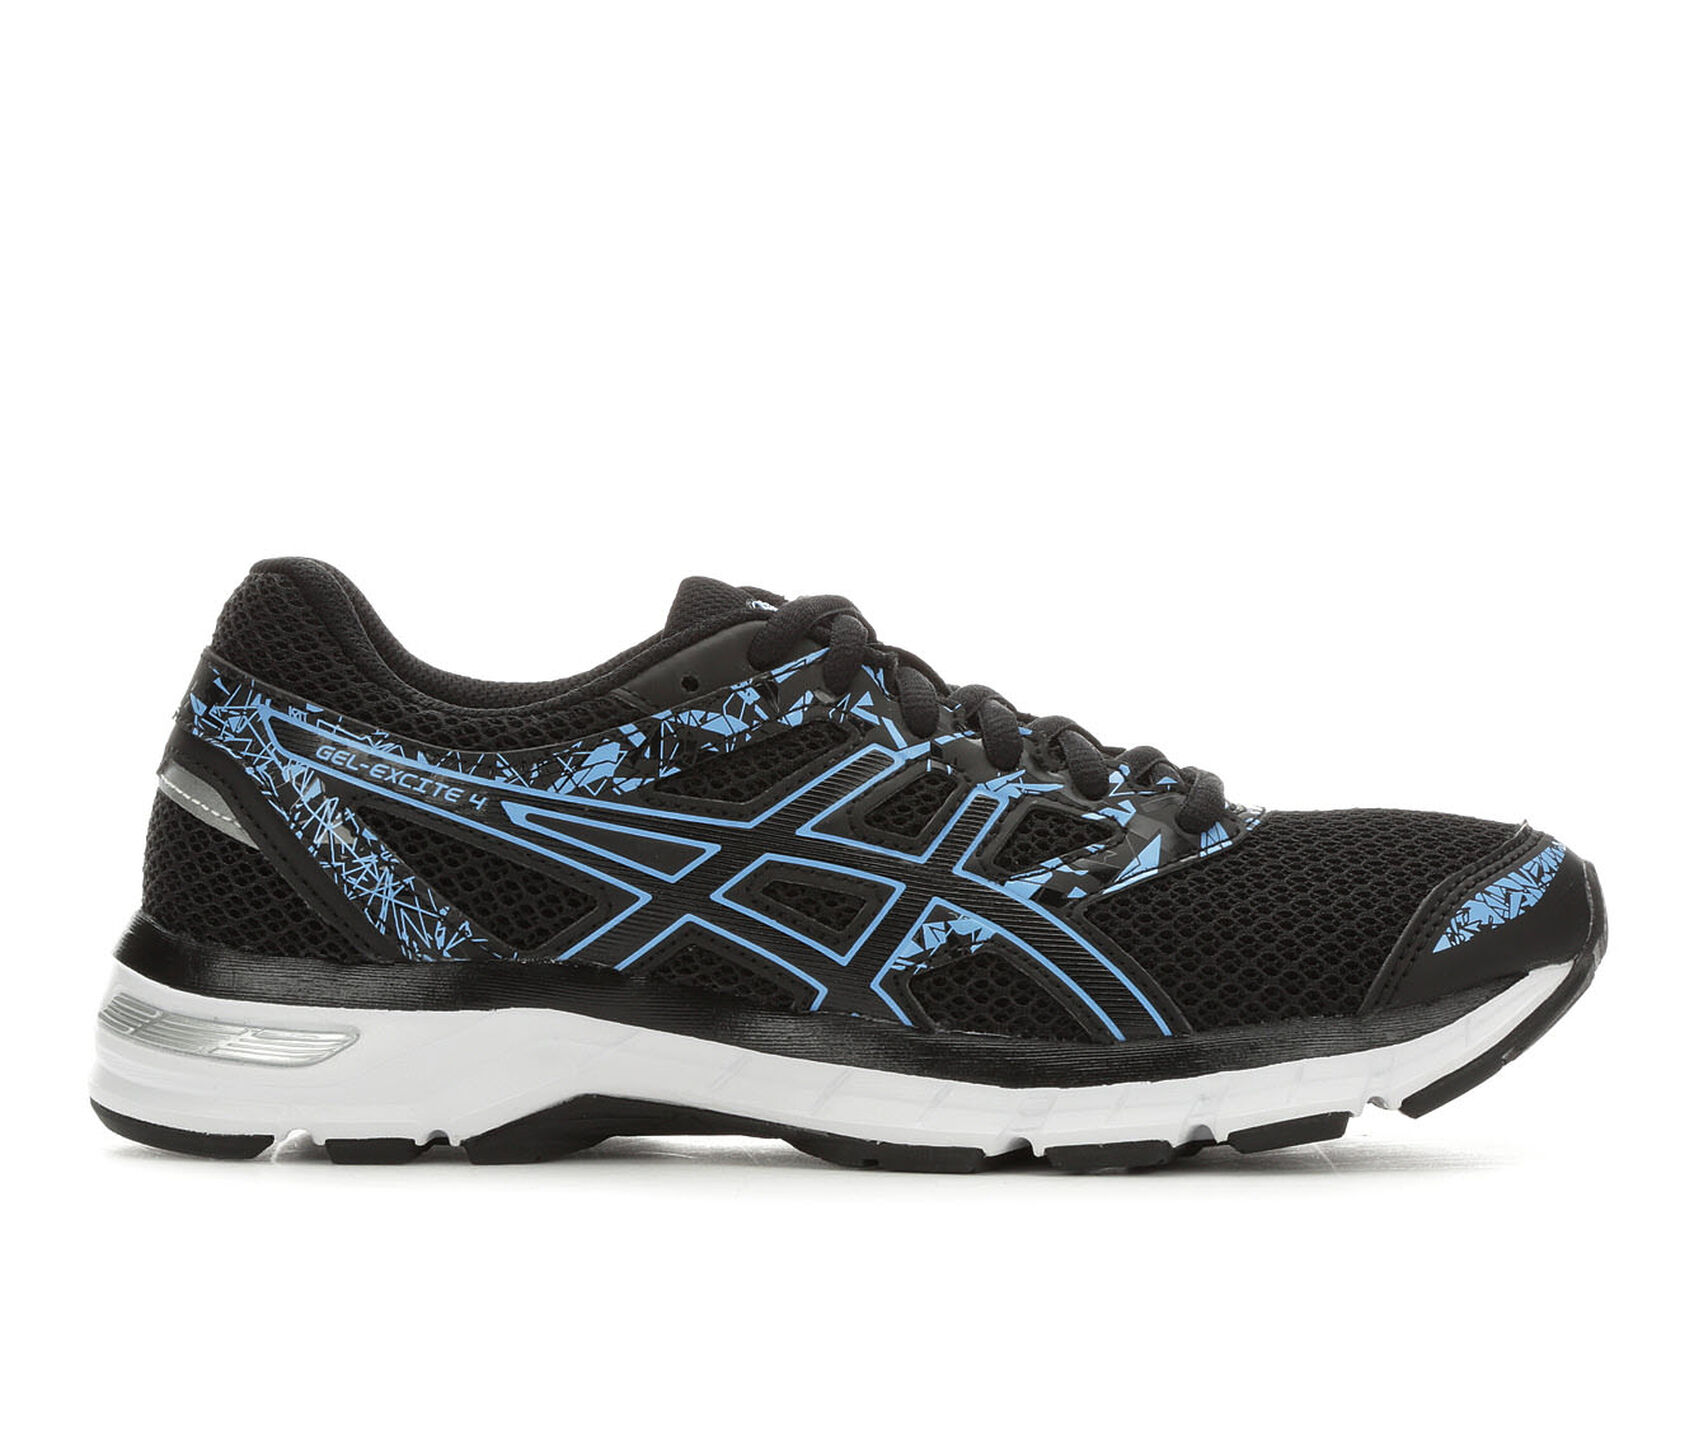 514d0423b5b Women s ASICS Gel Excite 4 Running Shoes